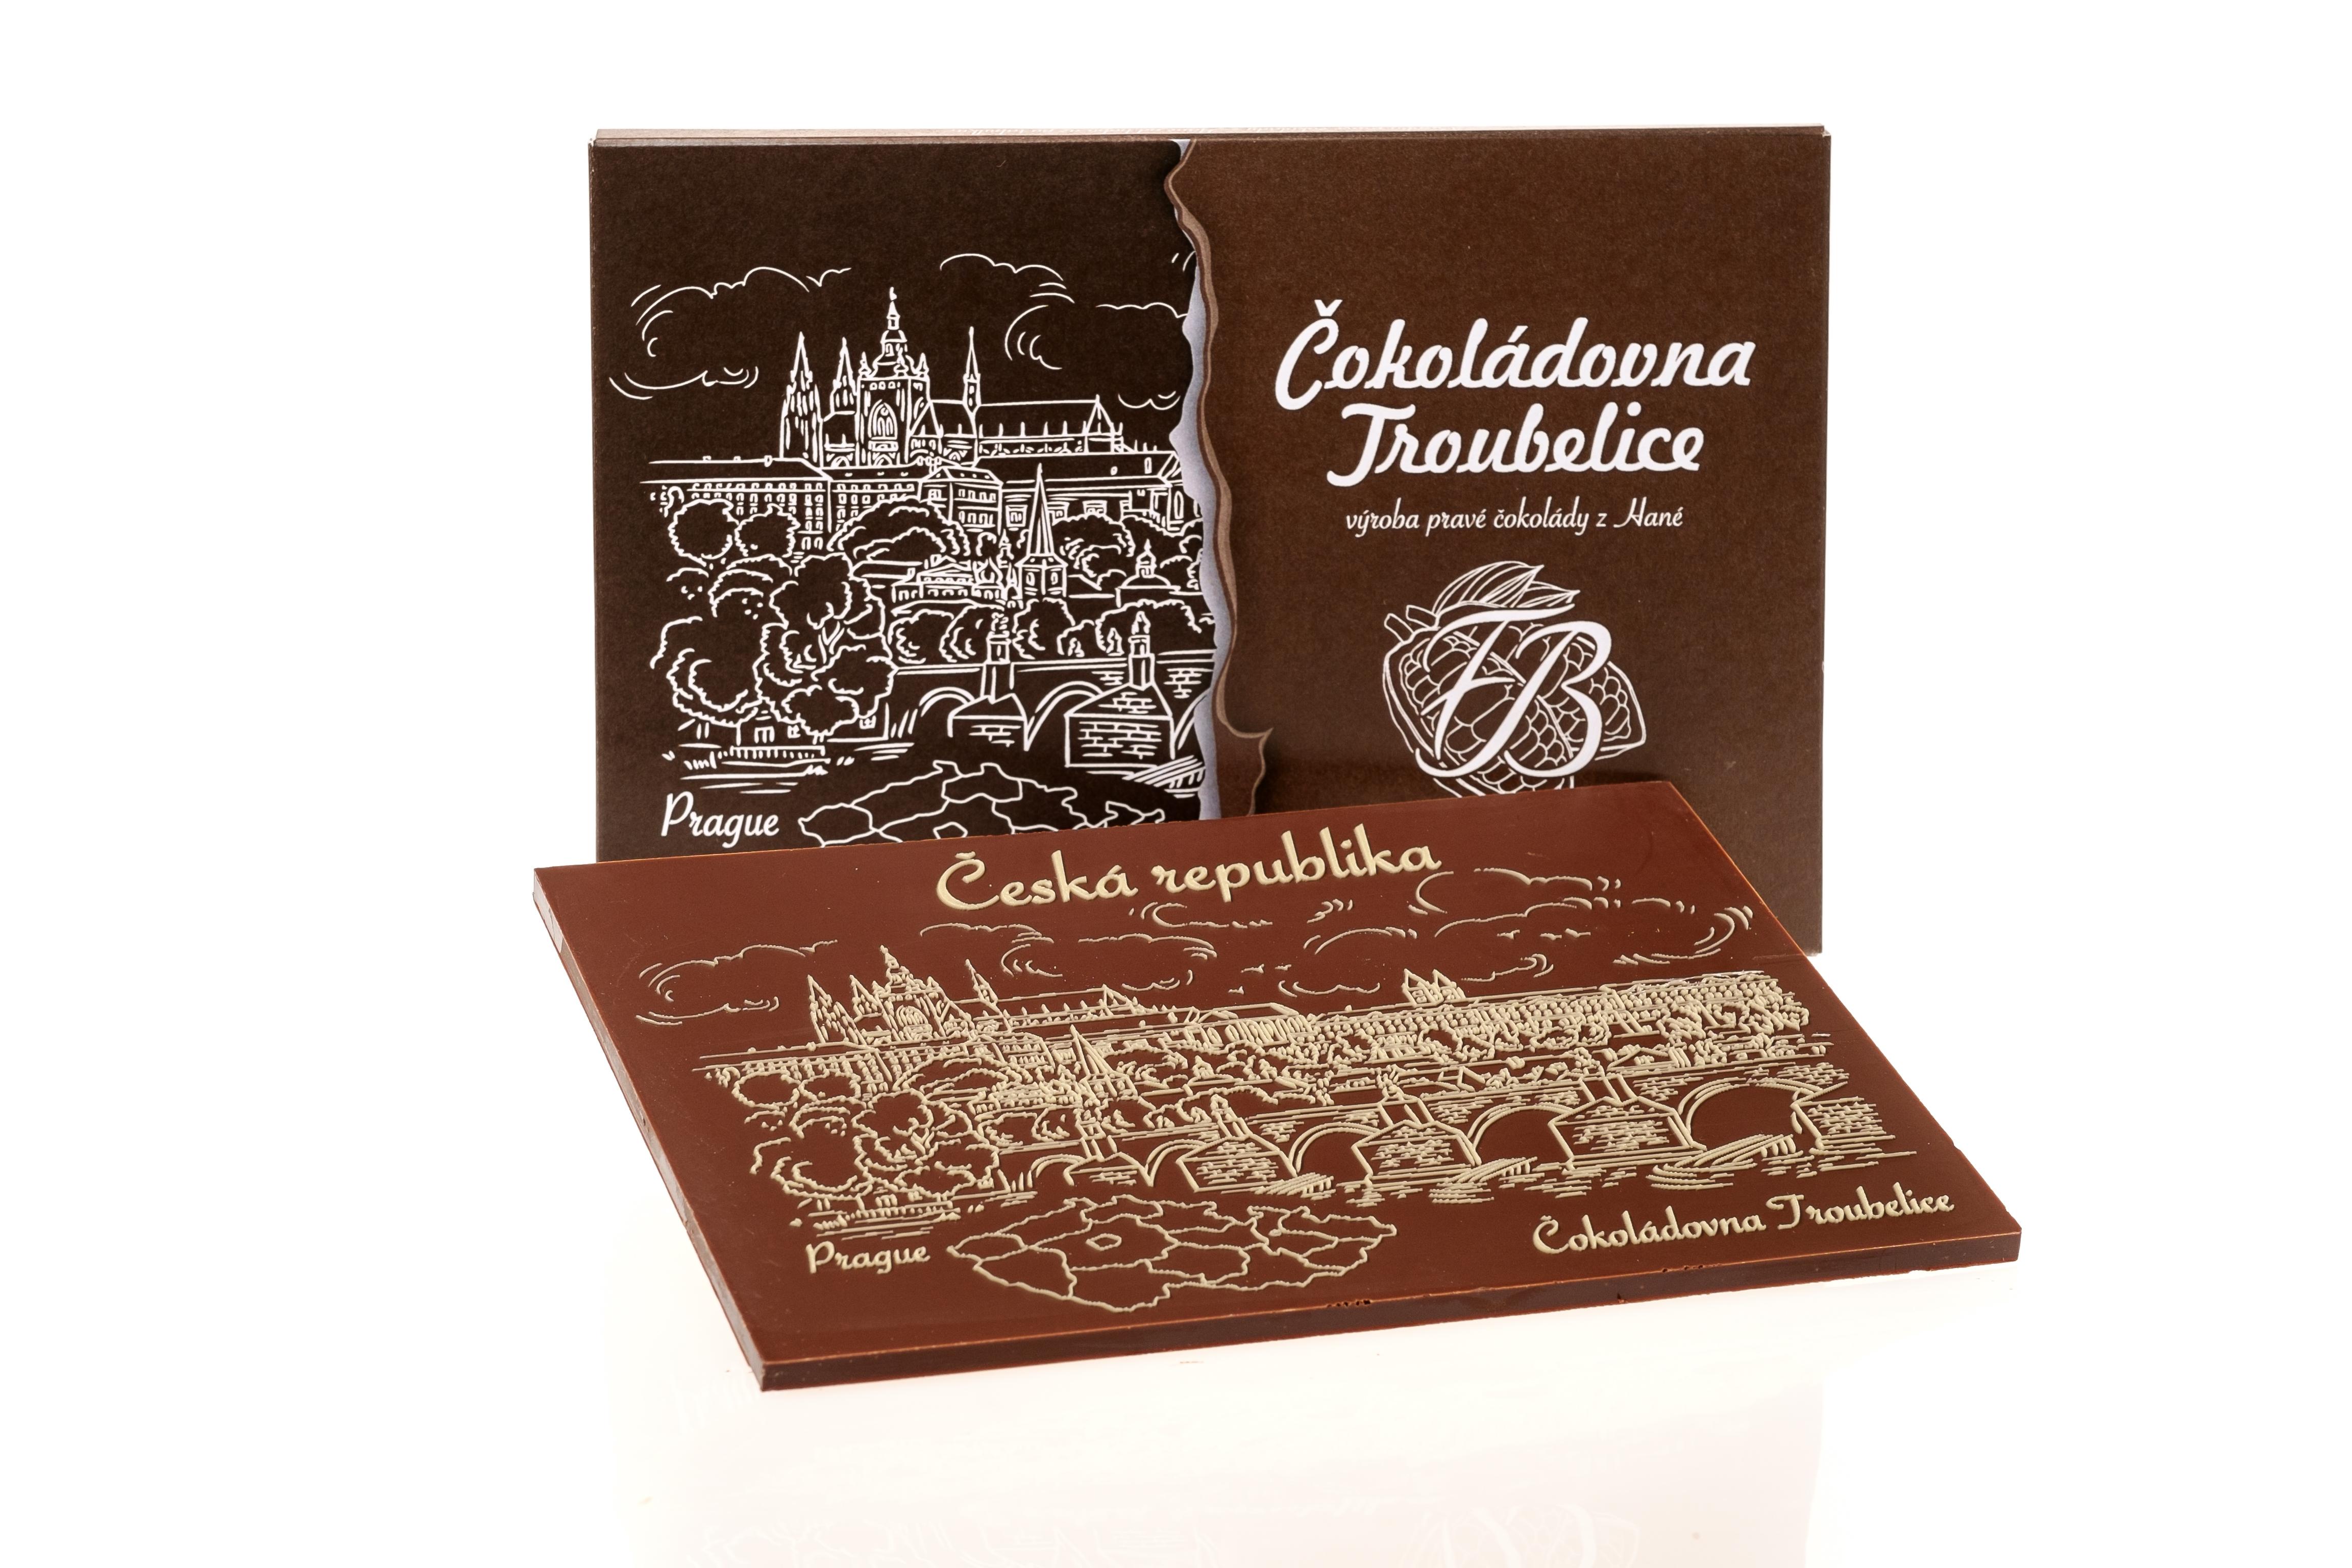 Cokoladovna_troubelice-83